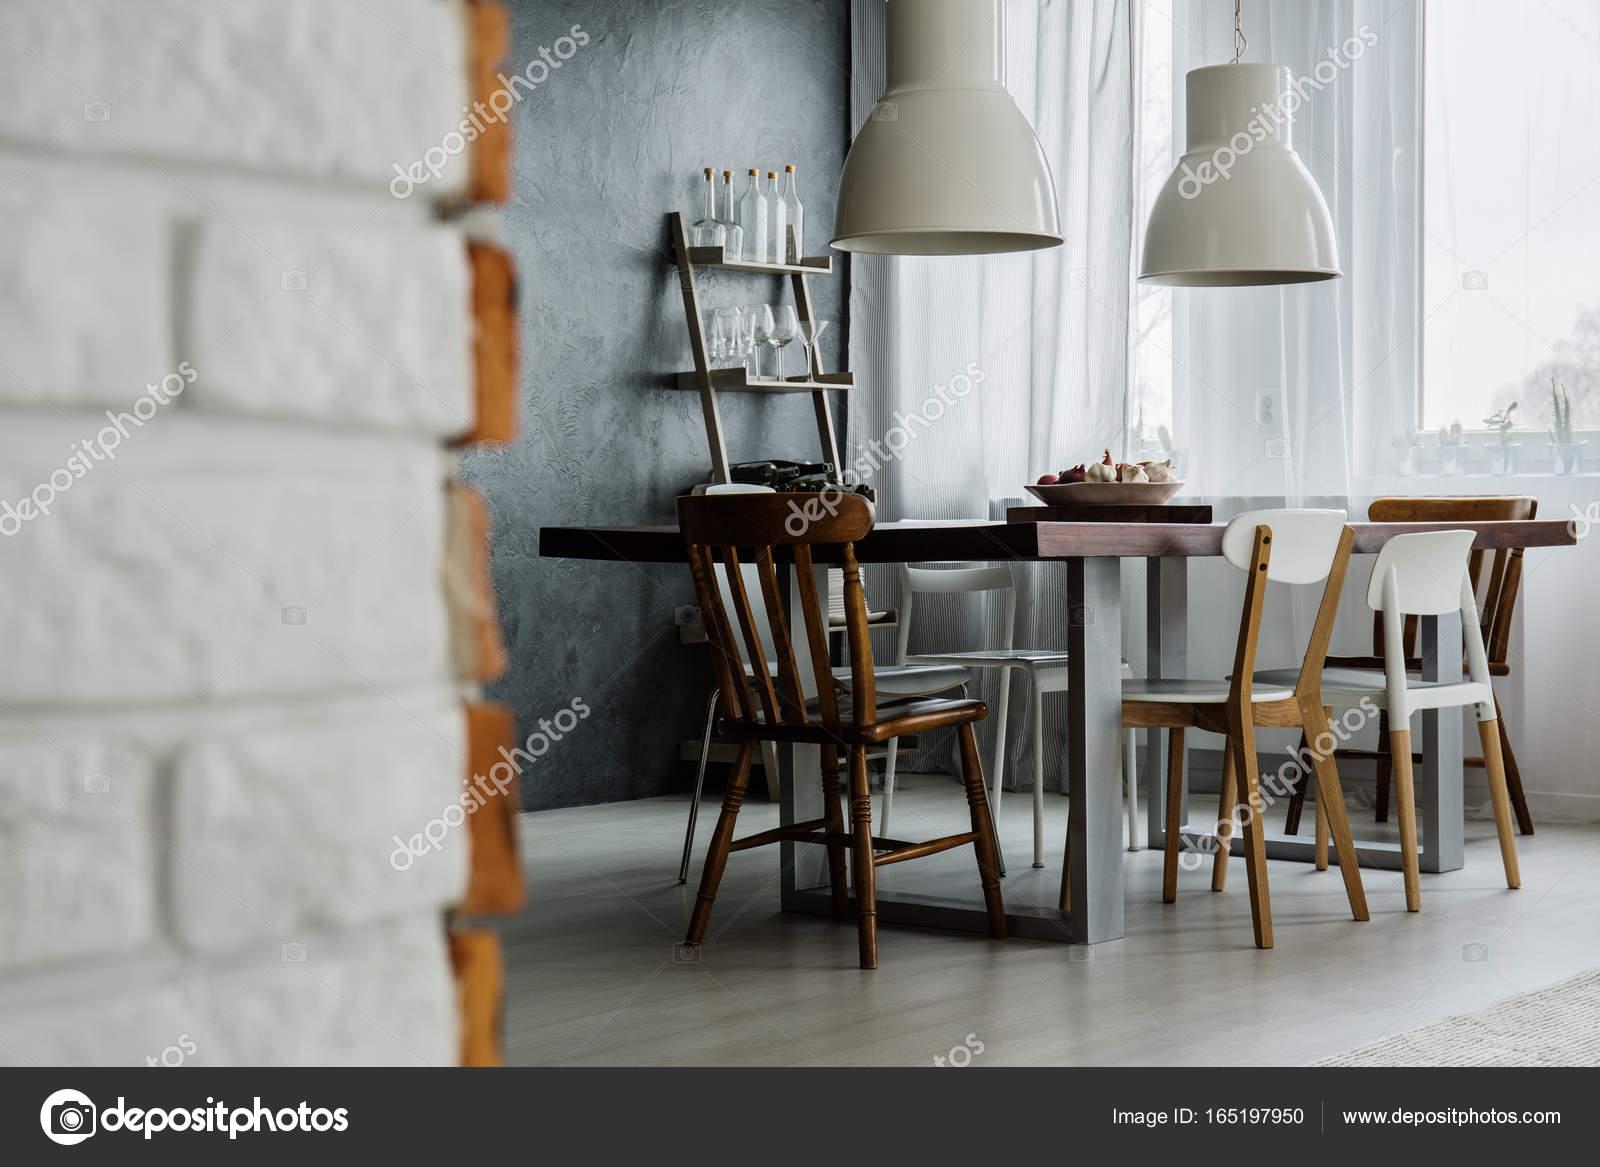 Chique Industriele Keuken : Chique industriële eetkamer ontwerp u stockfoto photographee eu